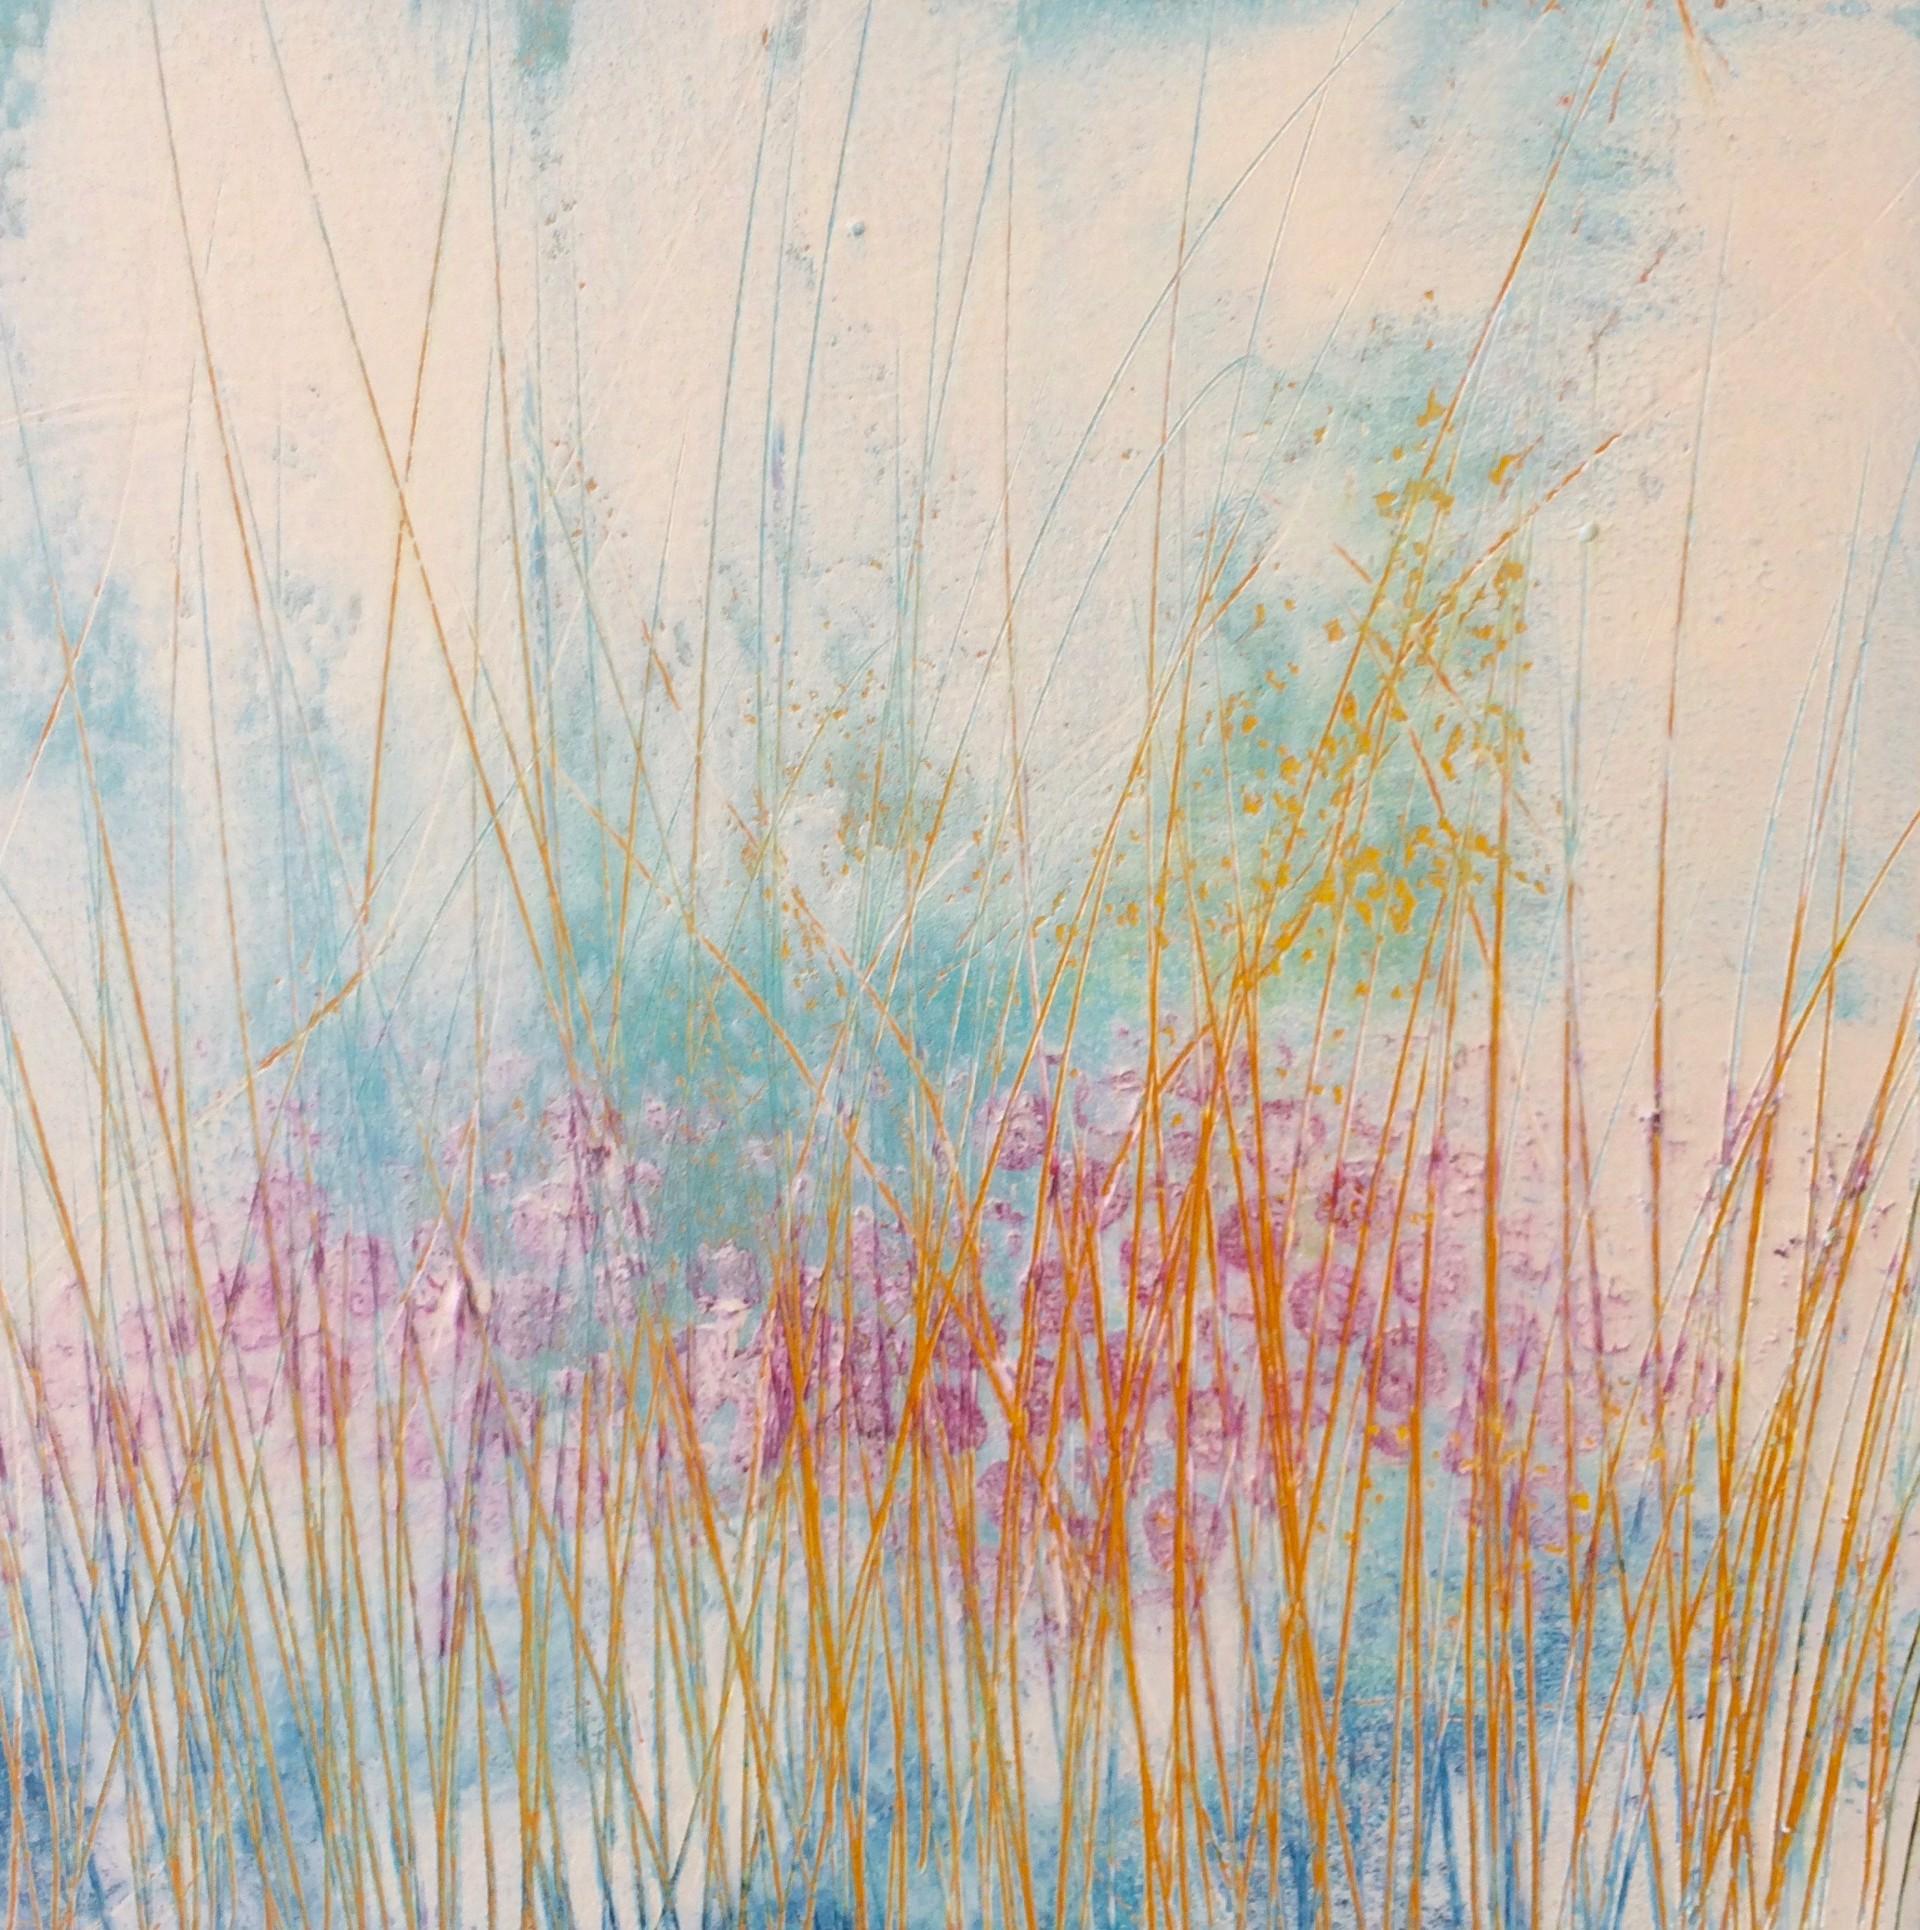 Blooms & Grasses #3 by Lori Elliott-Bartle